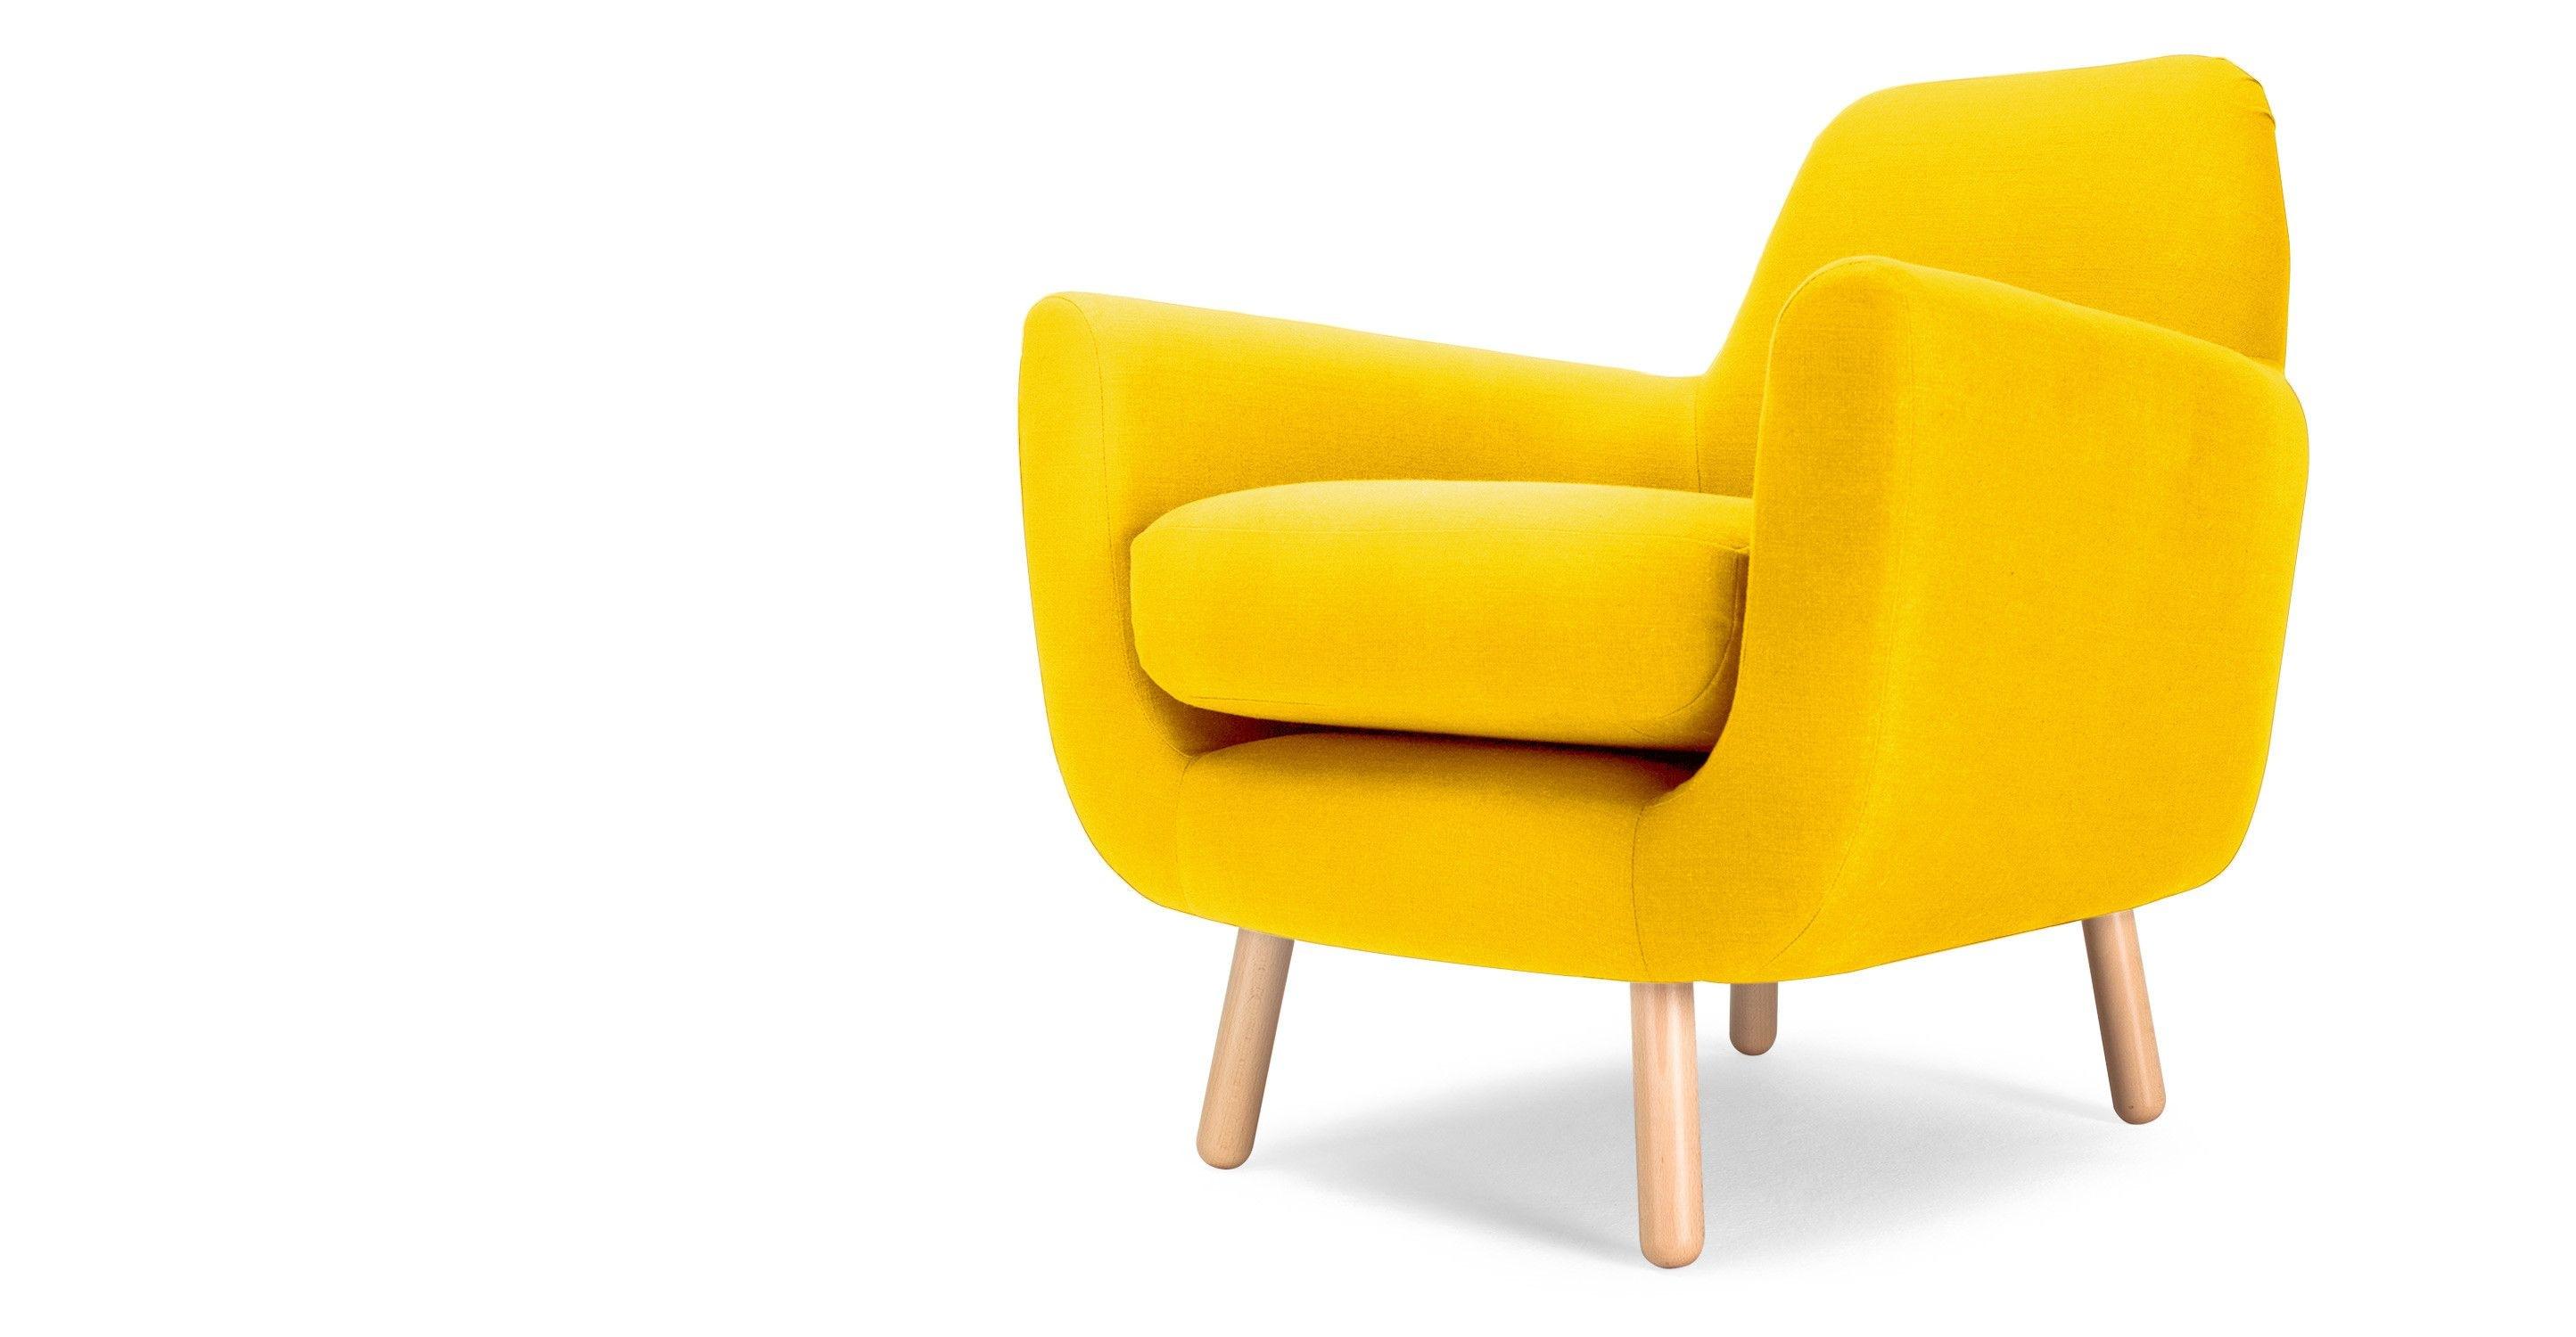 Chaise scandinave coque jaune fjord